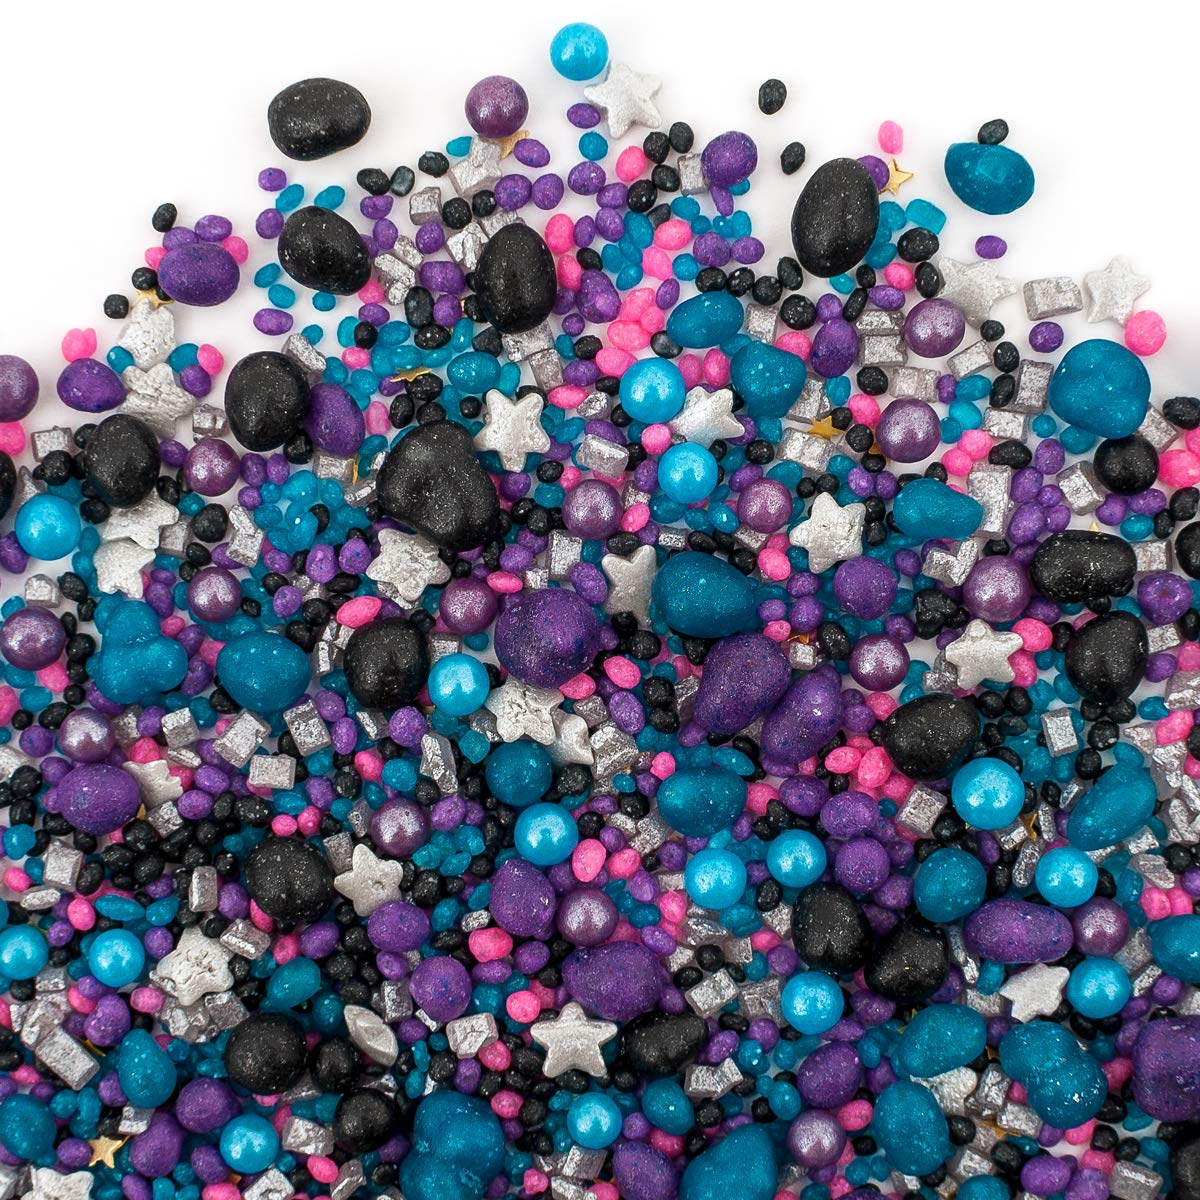 Sweets Indeed Sprinklefetti Galaxy Sprinkles (Galaxy Candy Sprinklefetti, 8 Ounce)